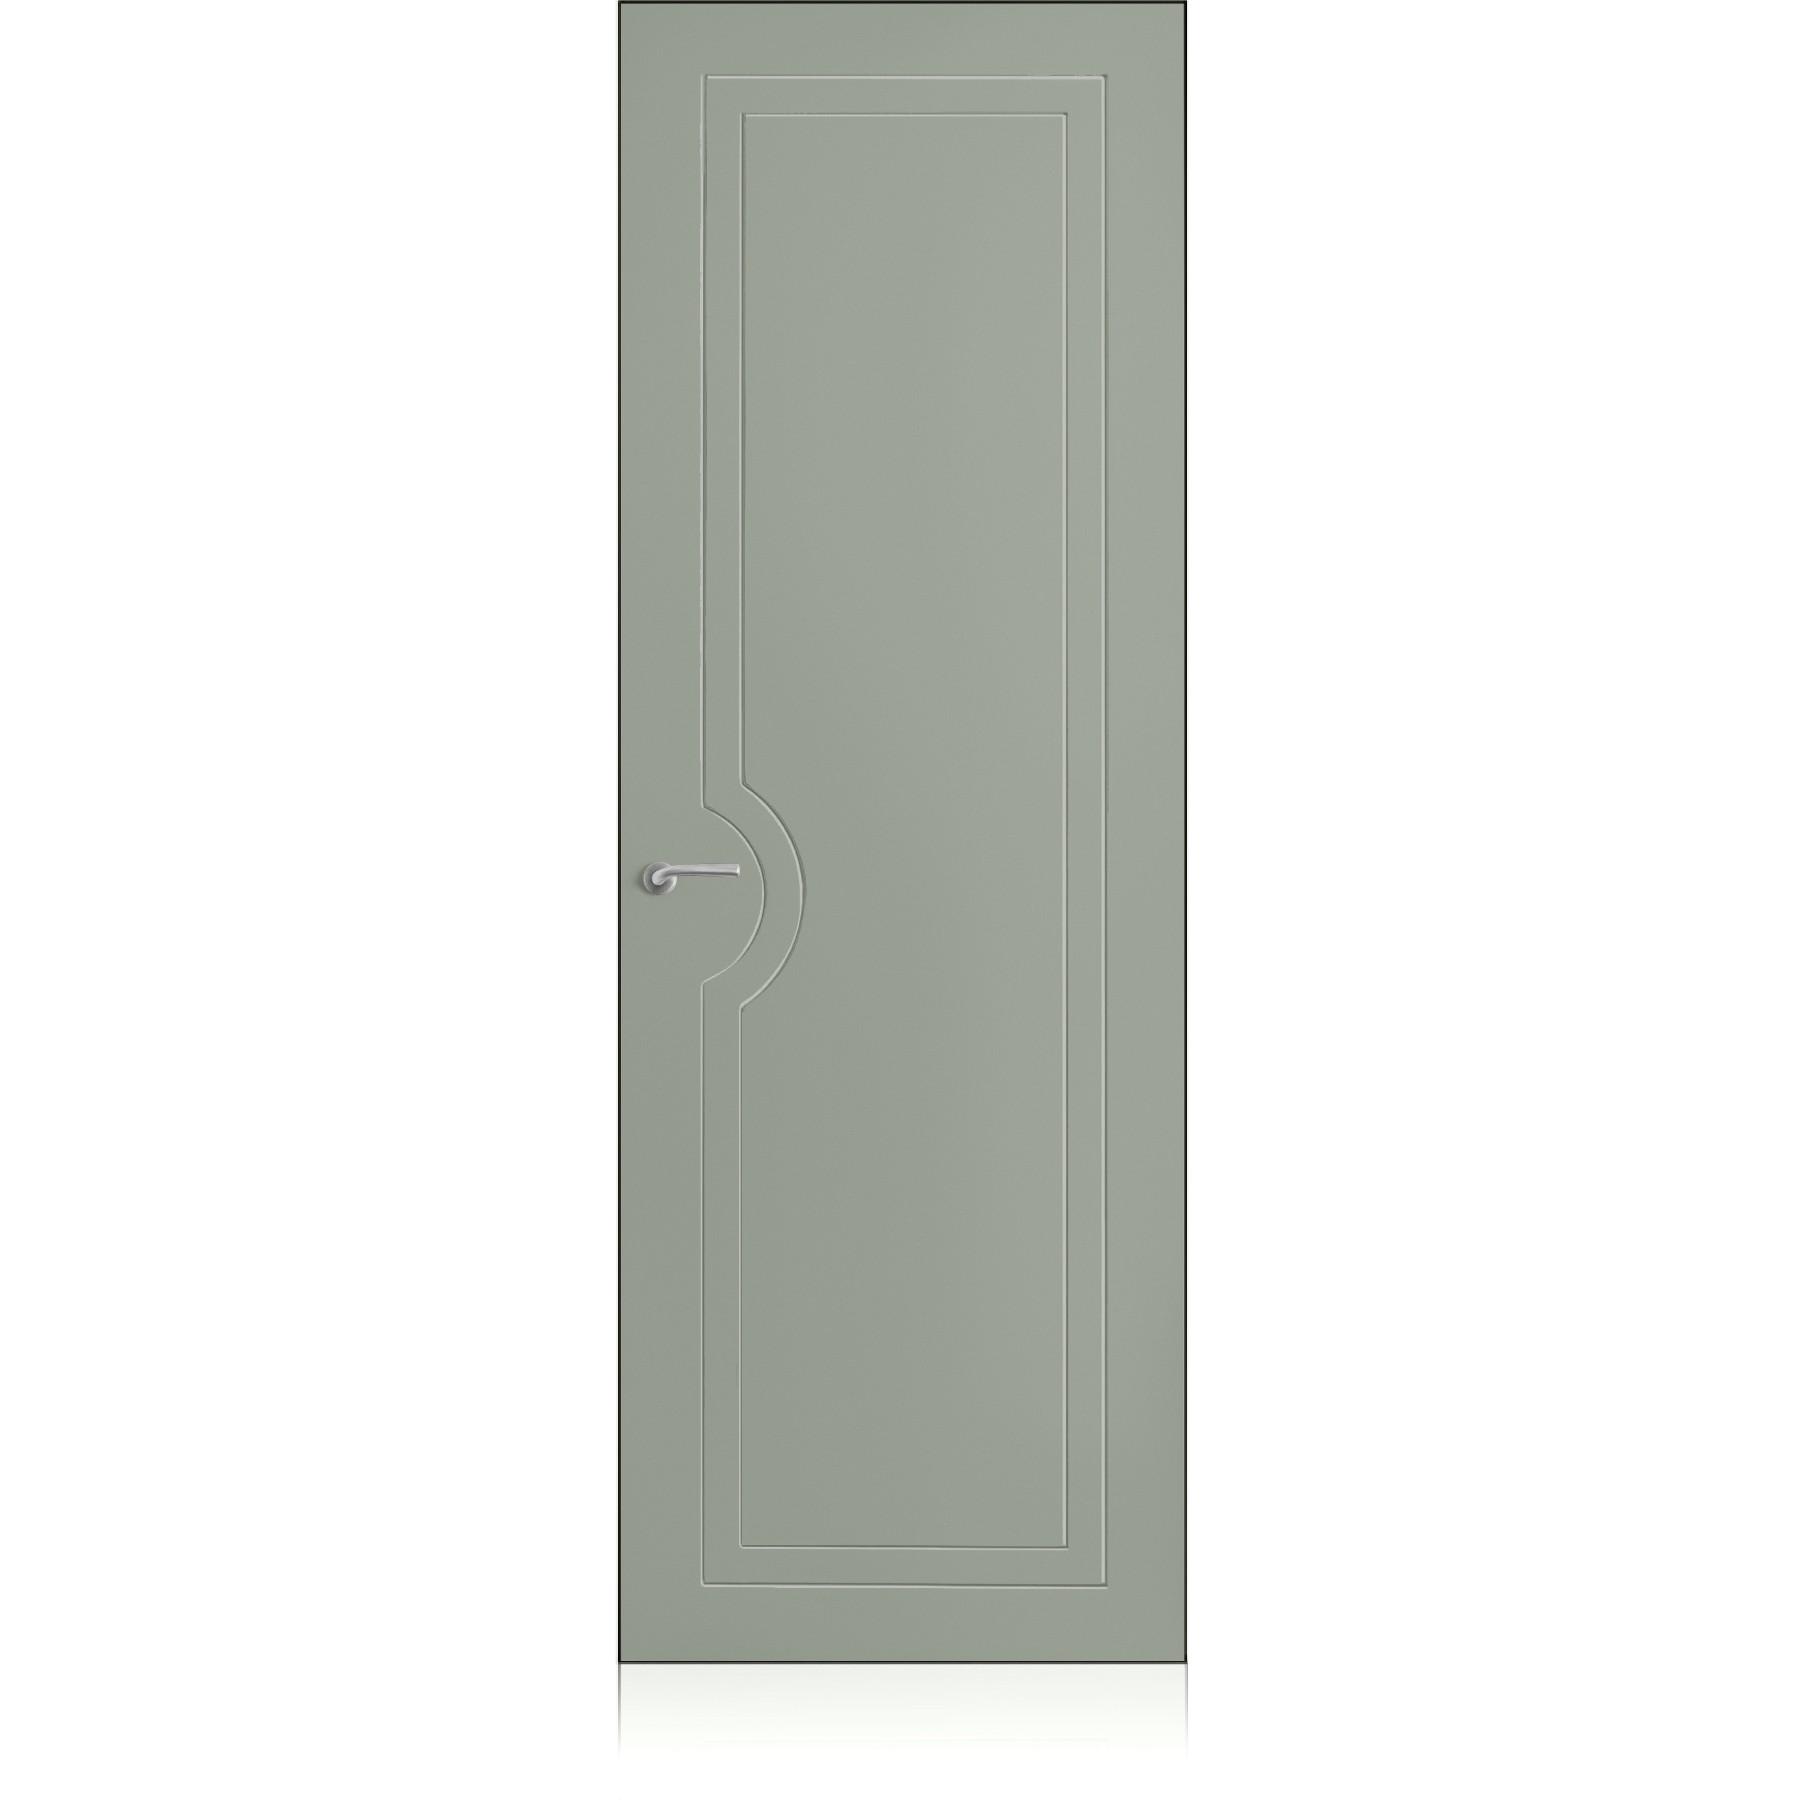 Yncisa/1 Zero Laguna Light Laccato ULTRAopaco door